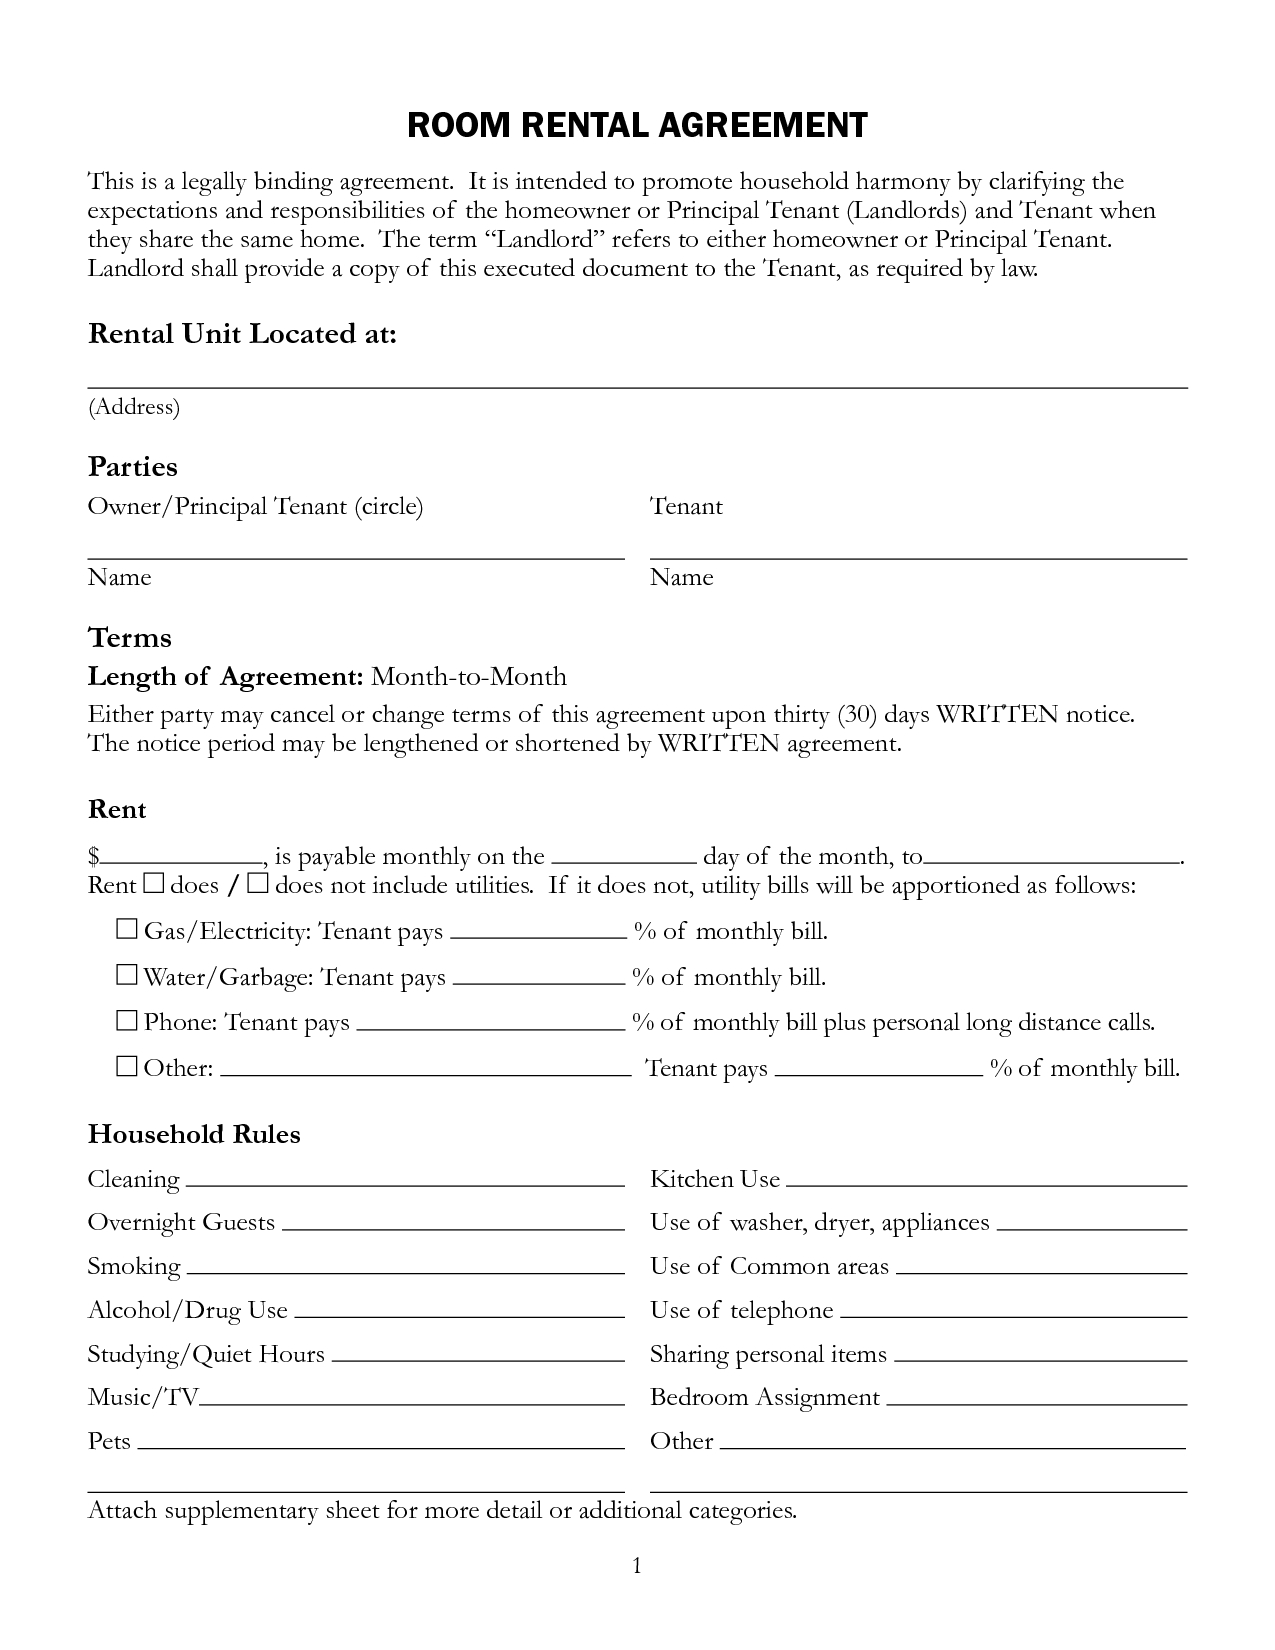 Free Printable Rental Lease Agreement Form Template | Bagnas - Free Printable Roommate Rental Agreement